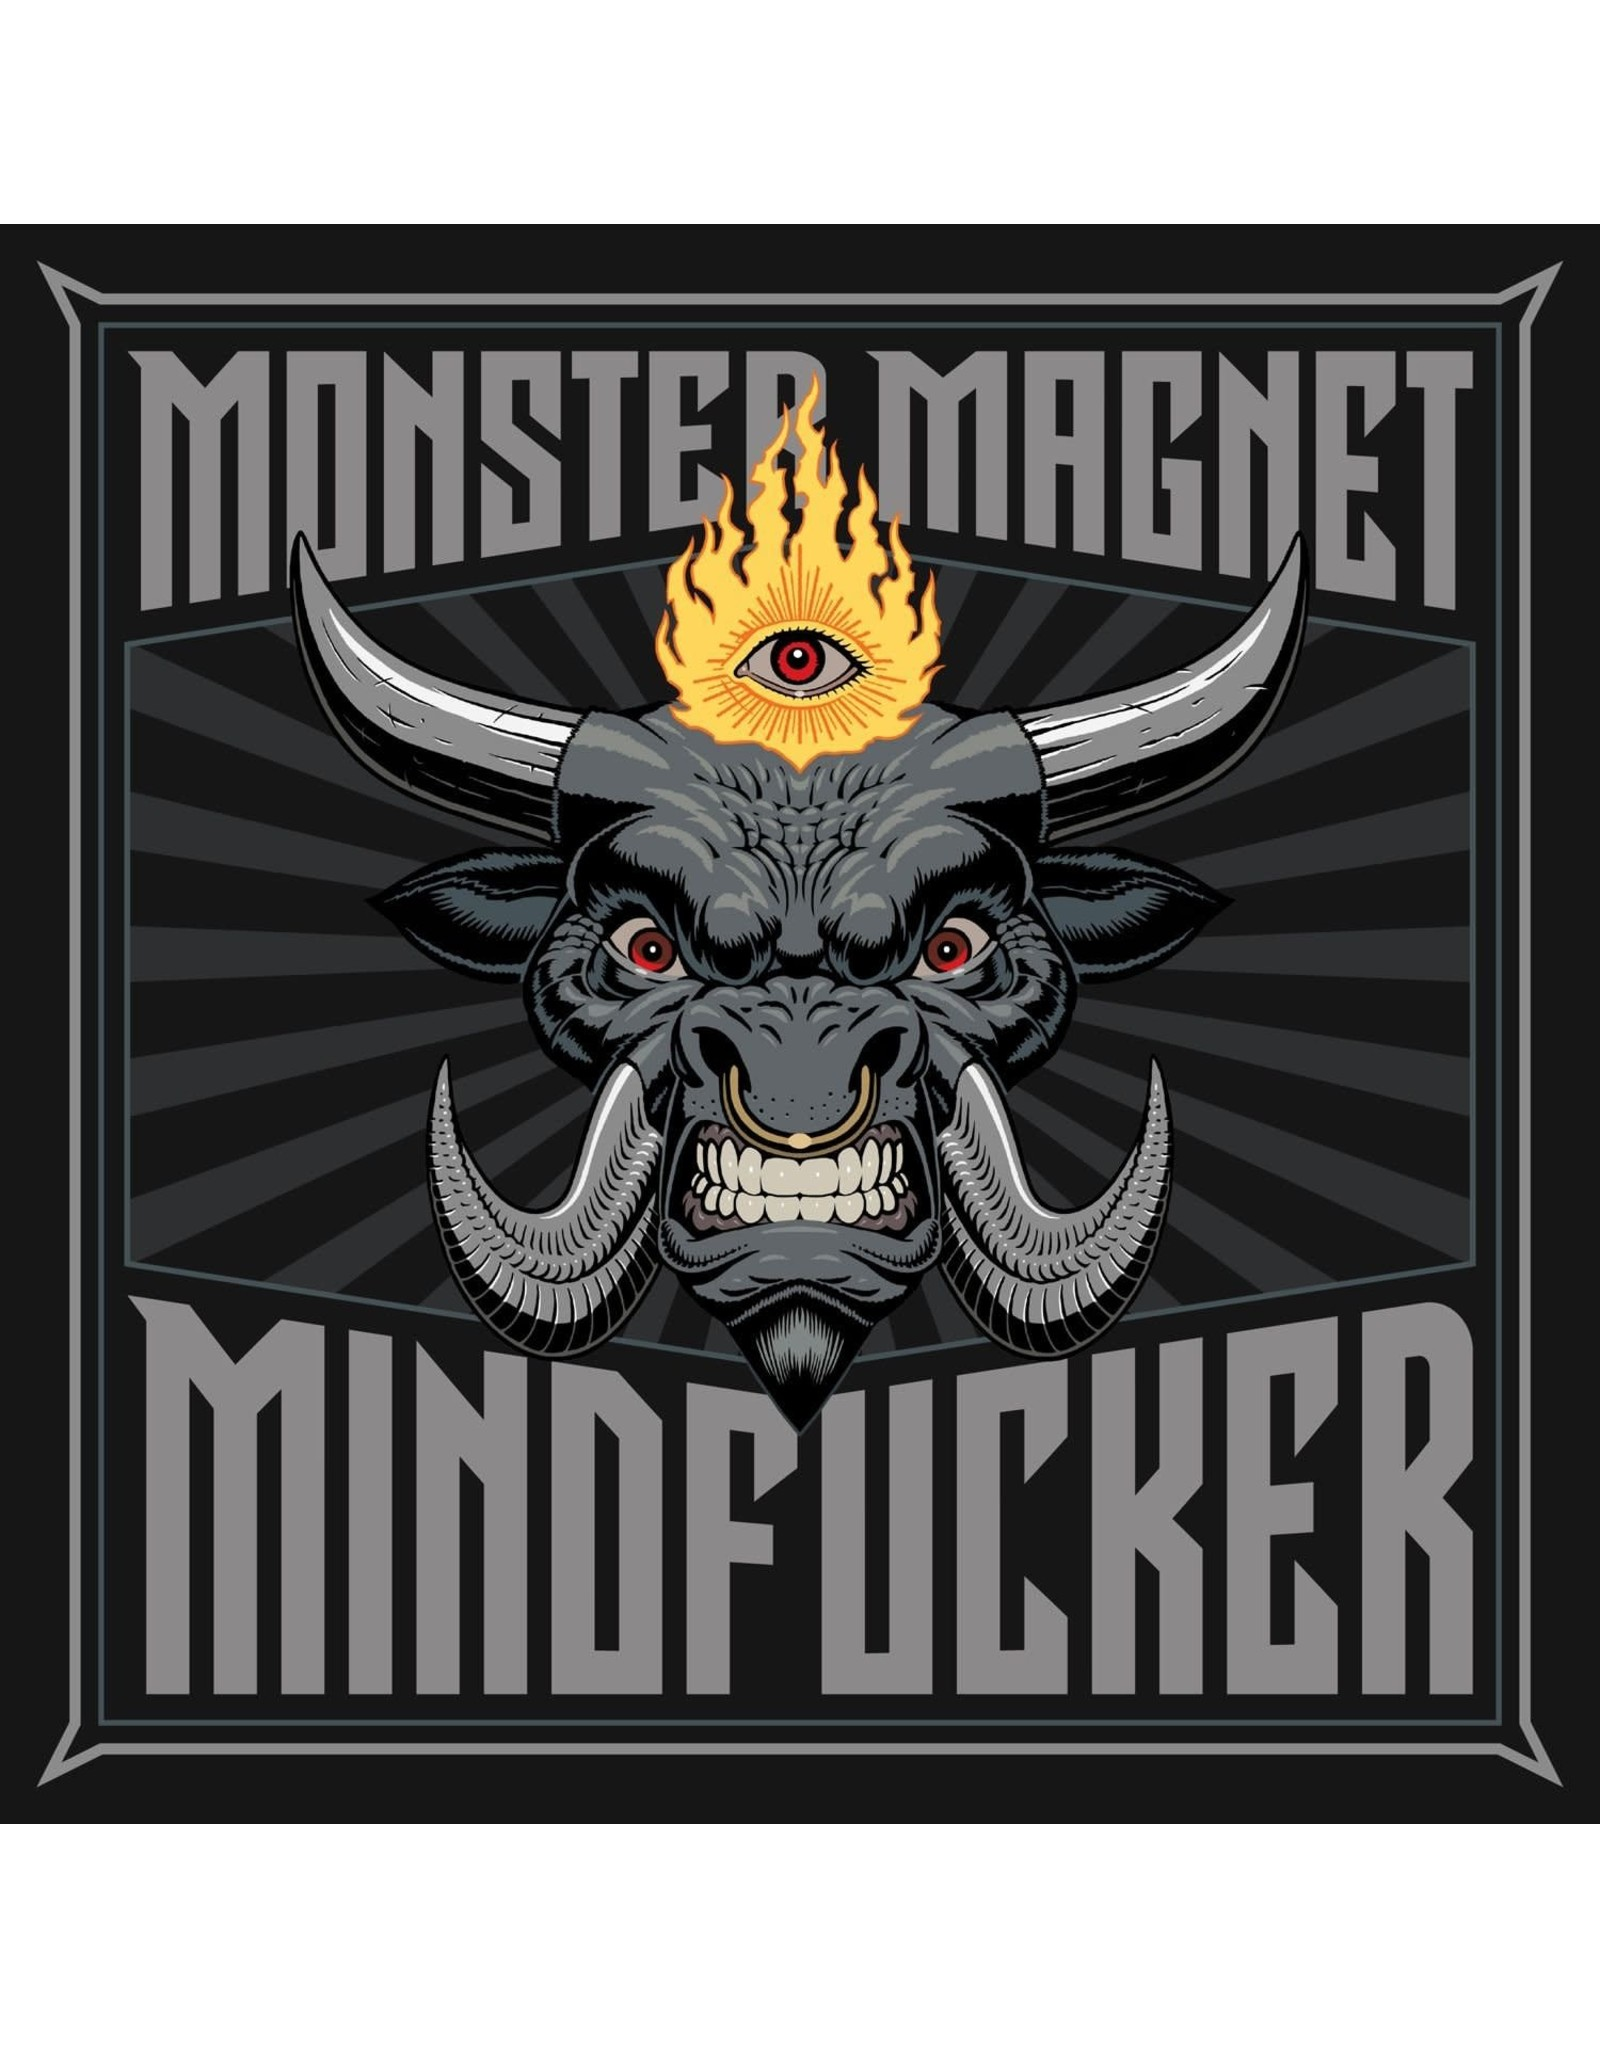 Monster Magnet - Mindfucker 2LP